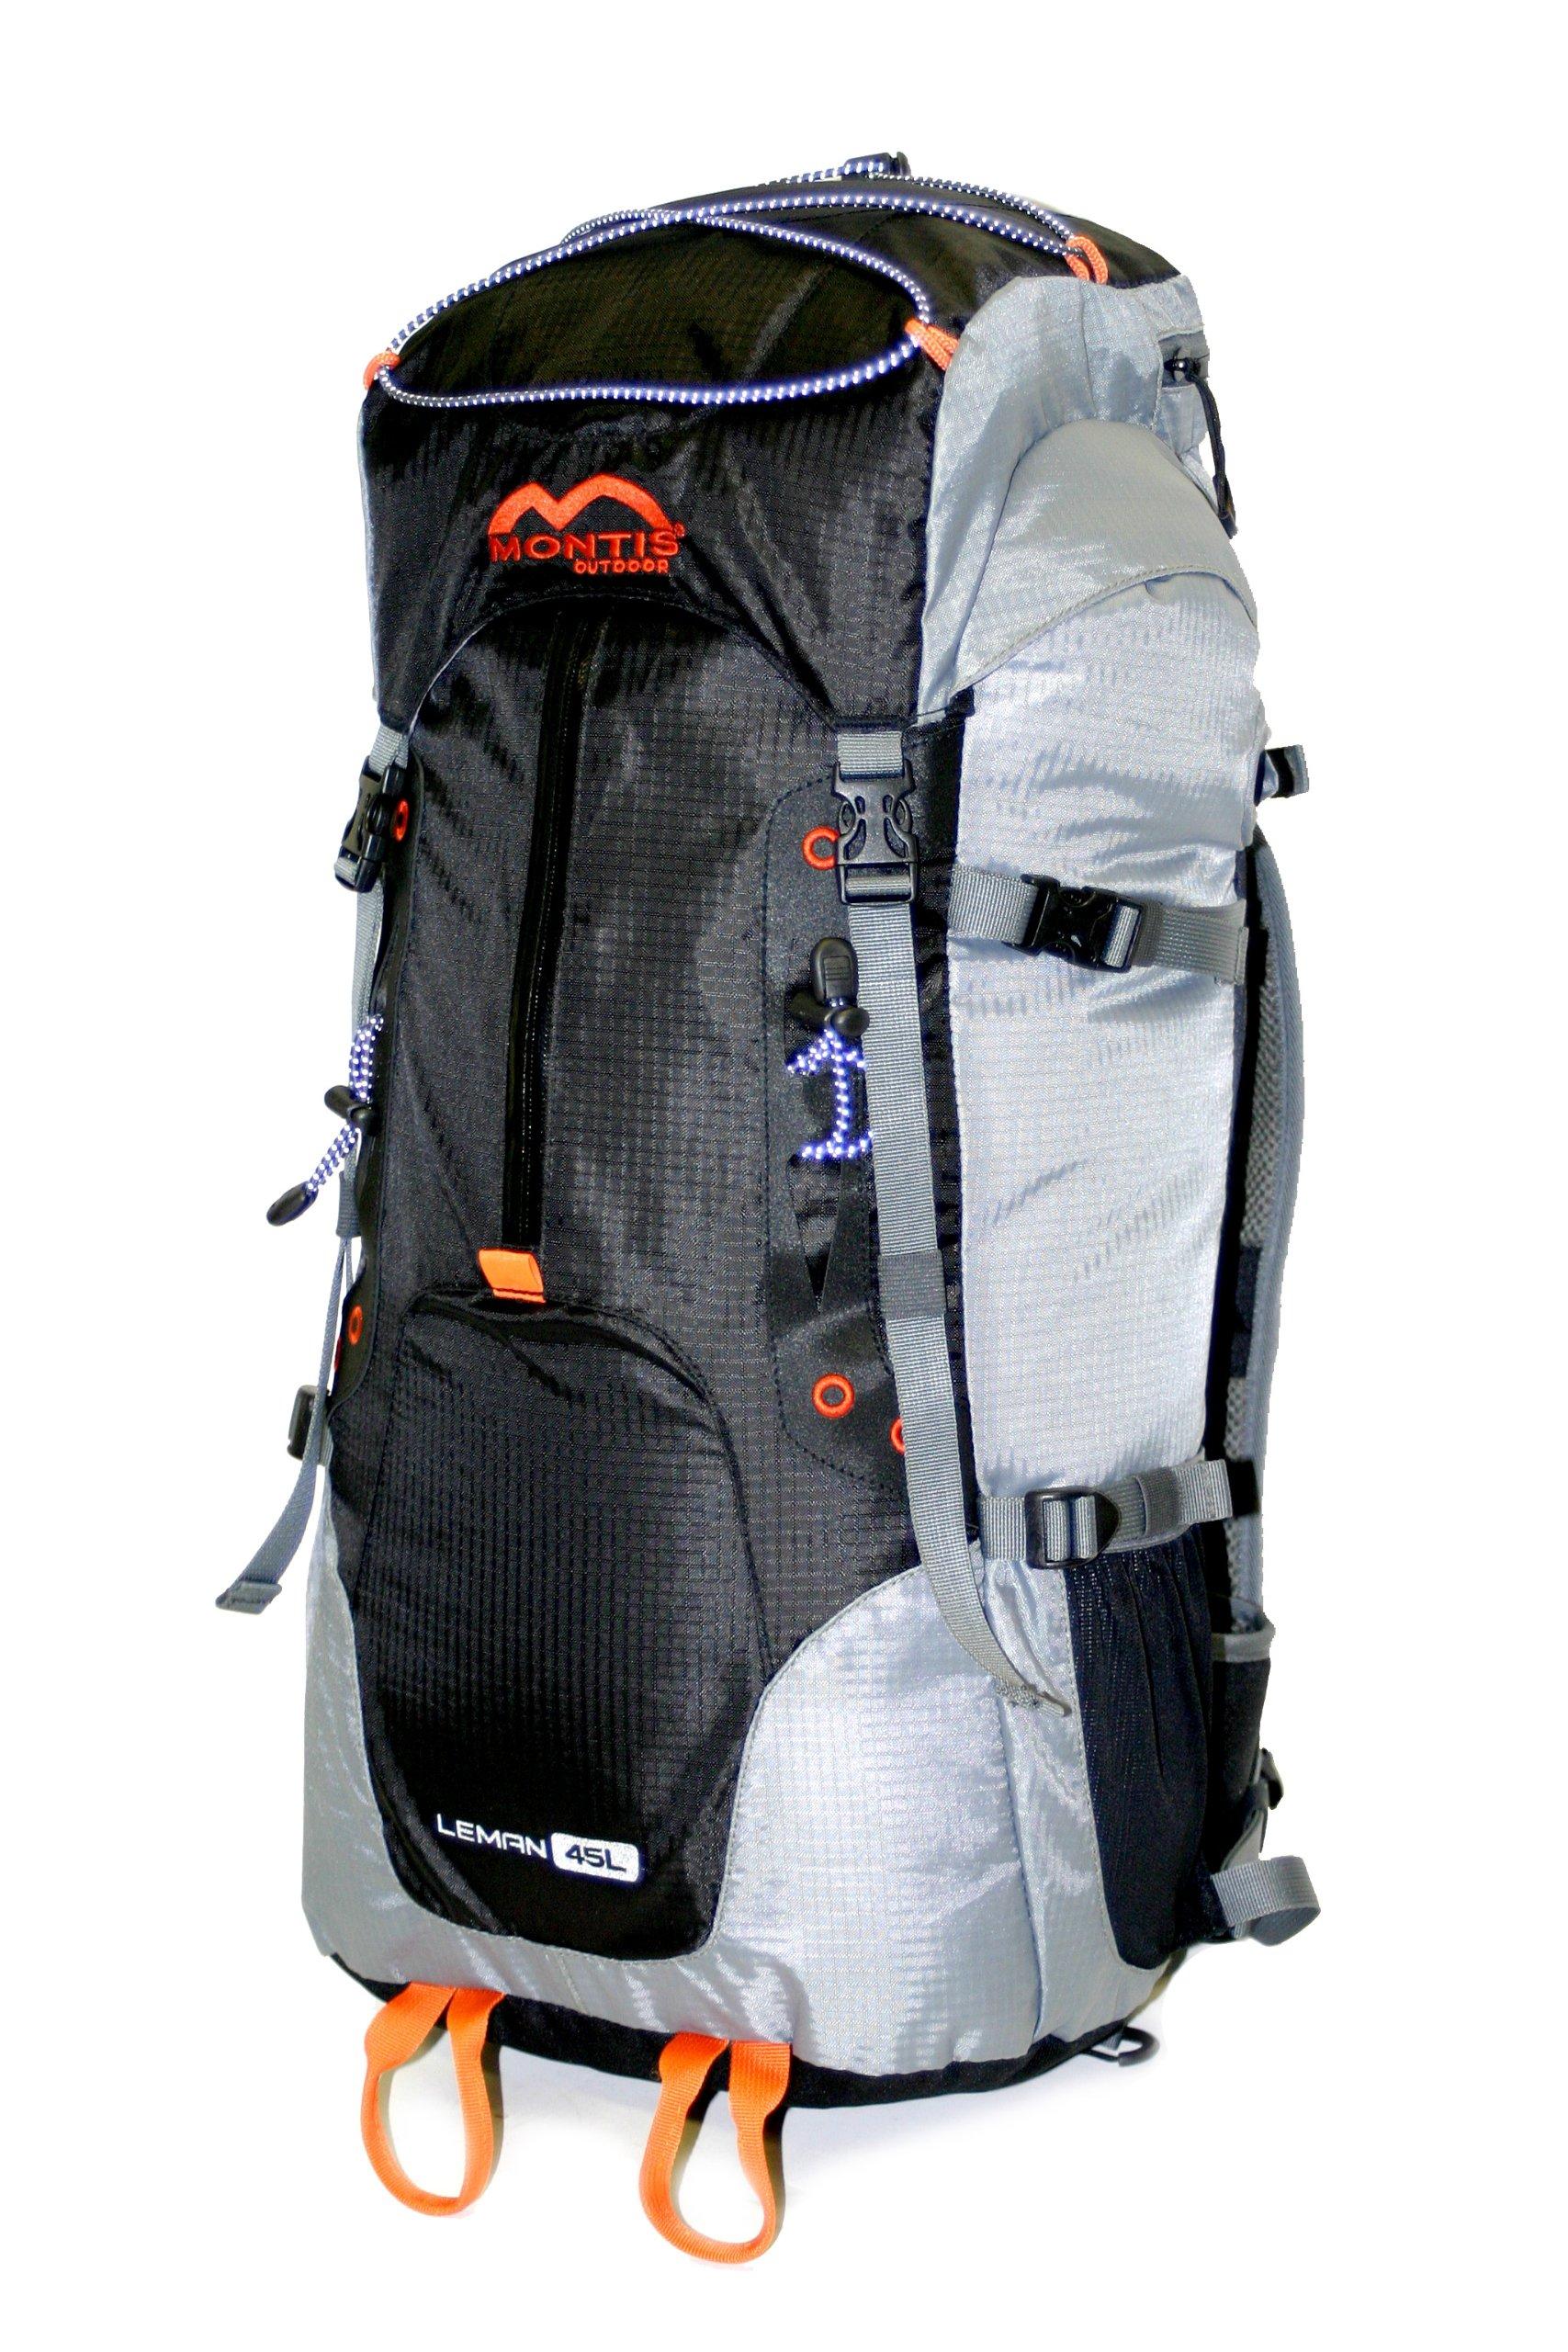 91gfXCmp6TL - MONTIS Leman 45, Mochila de Ruta, Trekking y Viajes, 45 l, 1300 g